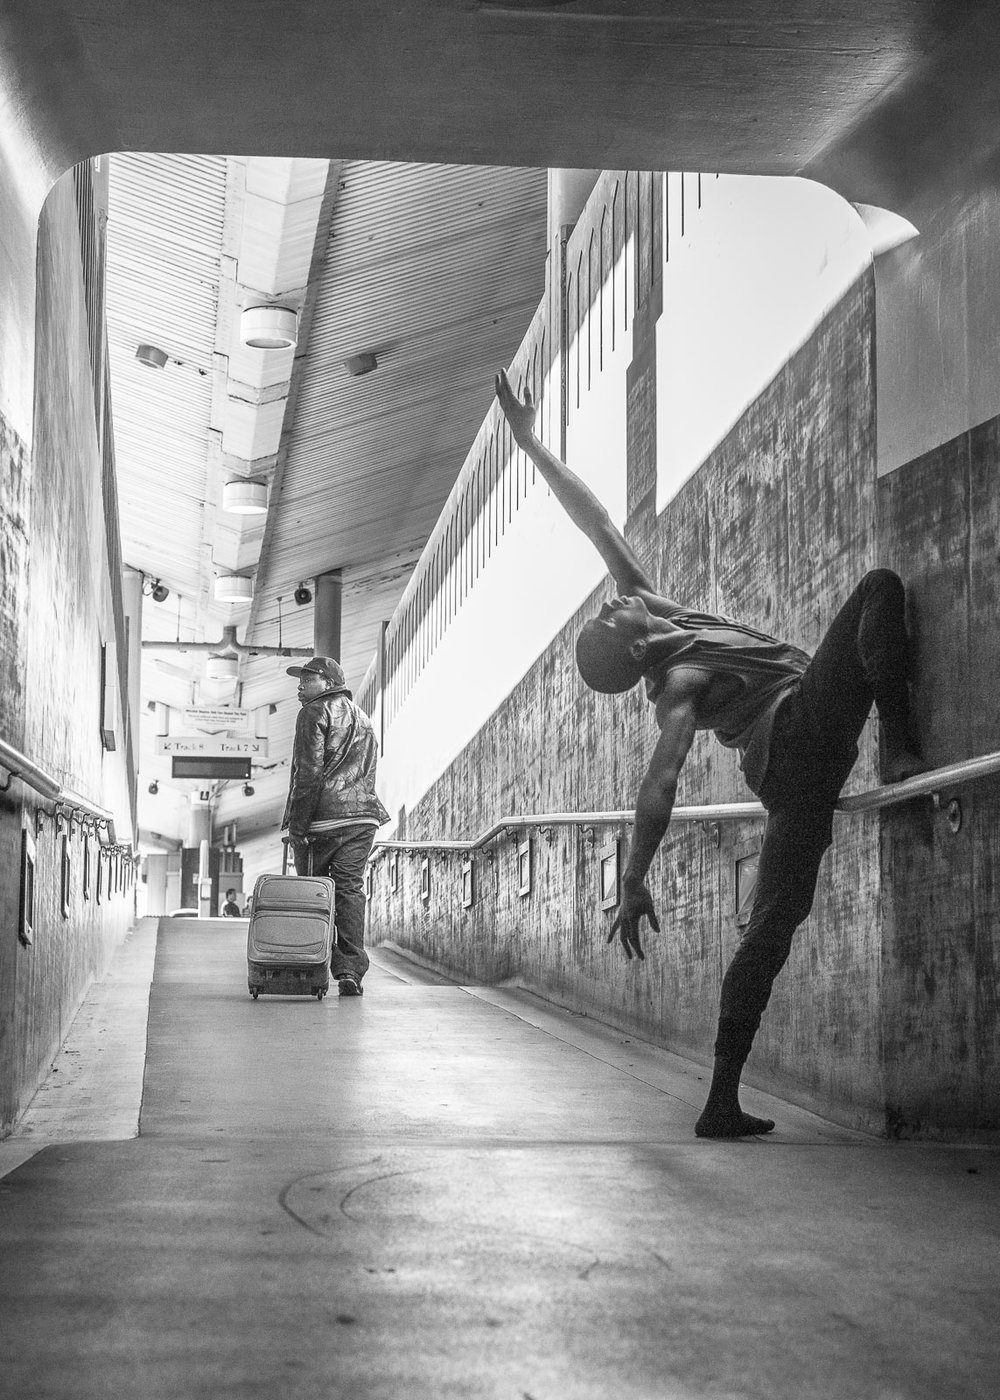 DancersandUnionStationDec2016 (1 of 1)-309.jpg